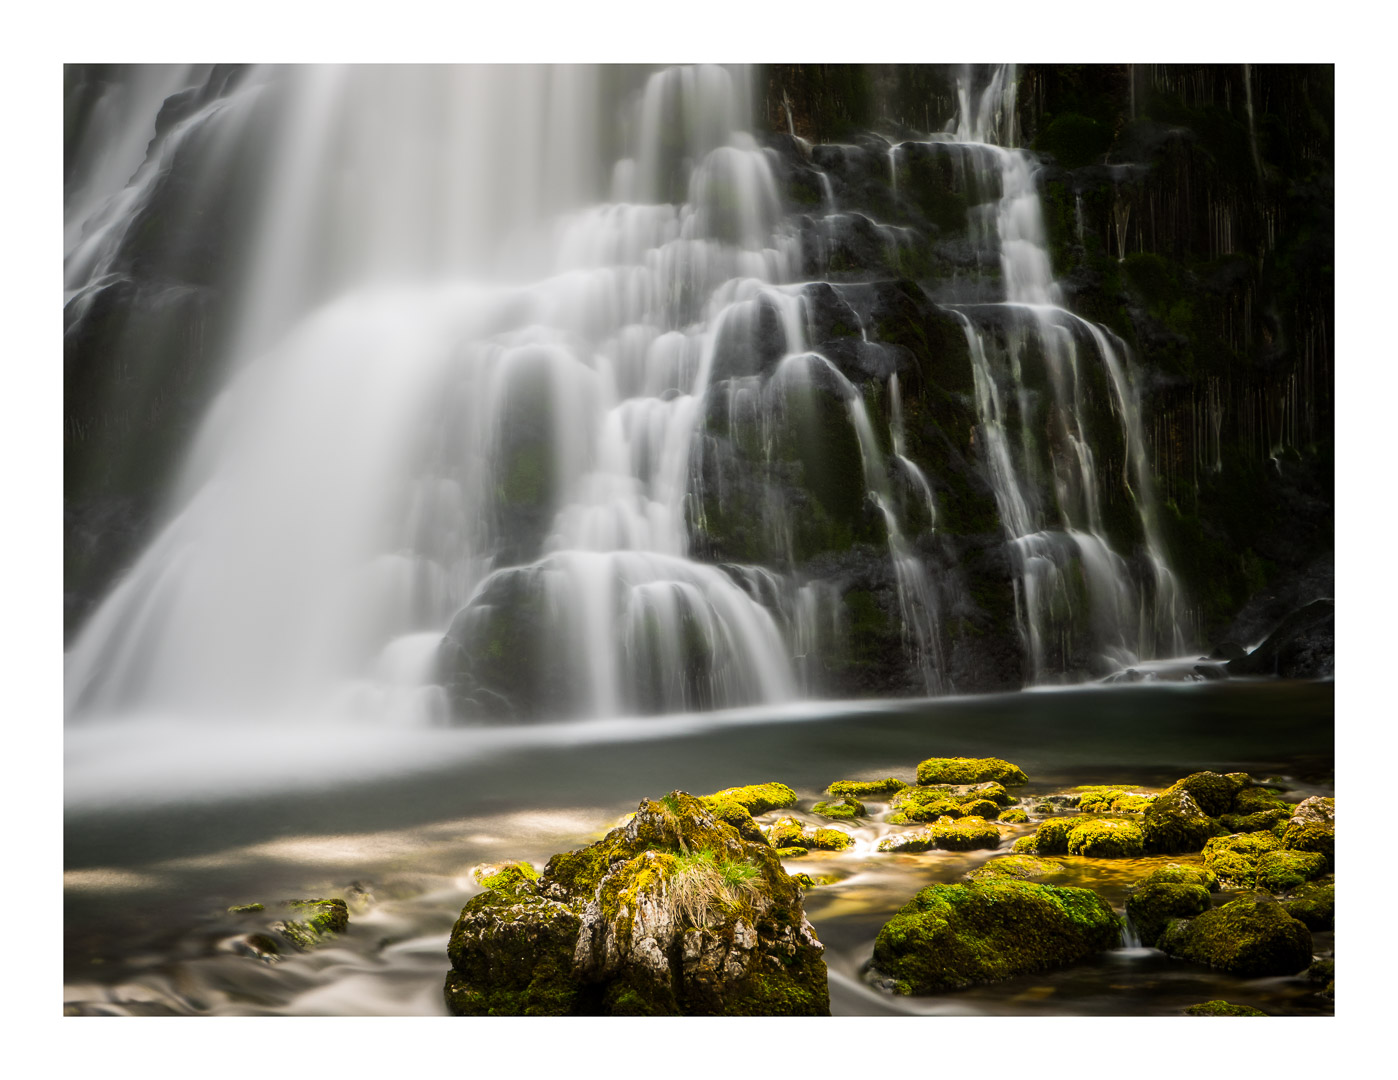 Gosauer Wasserfall